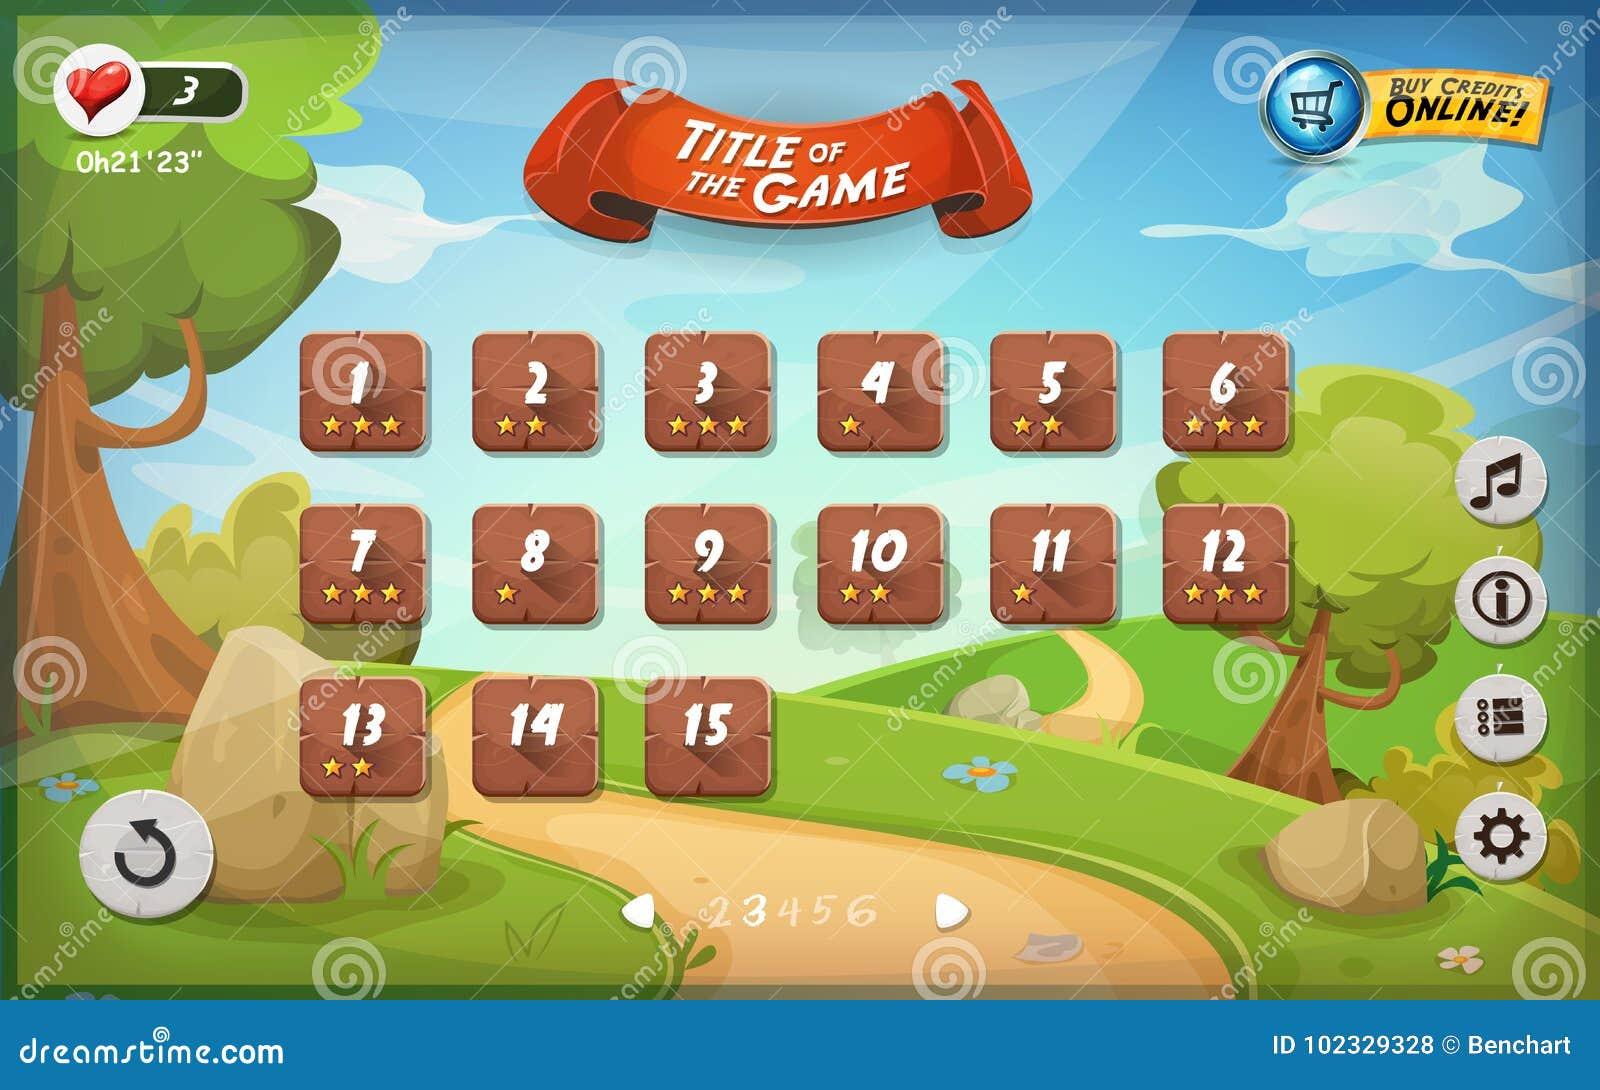 Game User Interface Design For Tablet Stock Vector - Illustration of